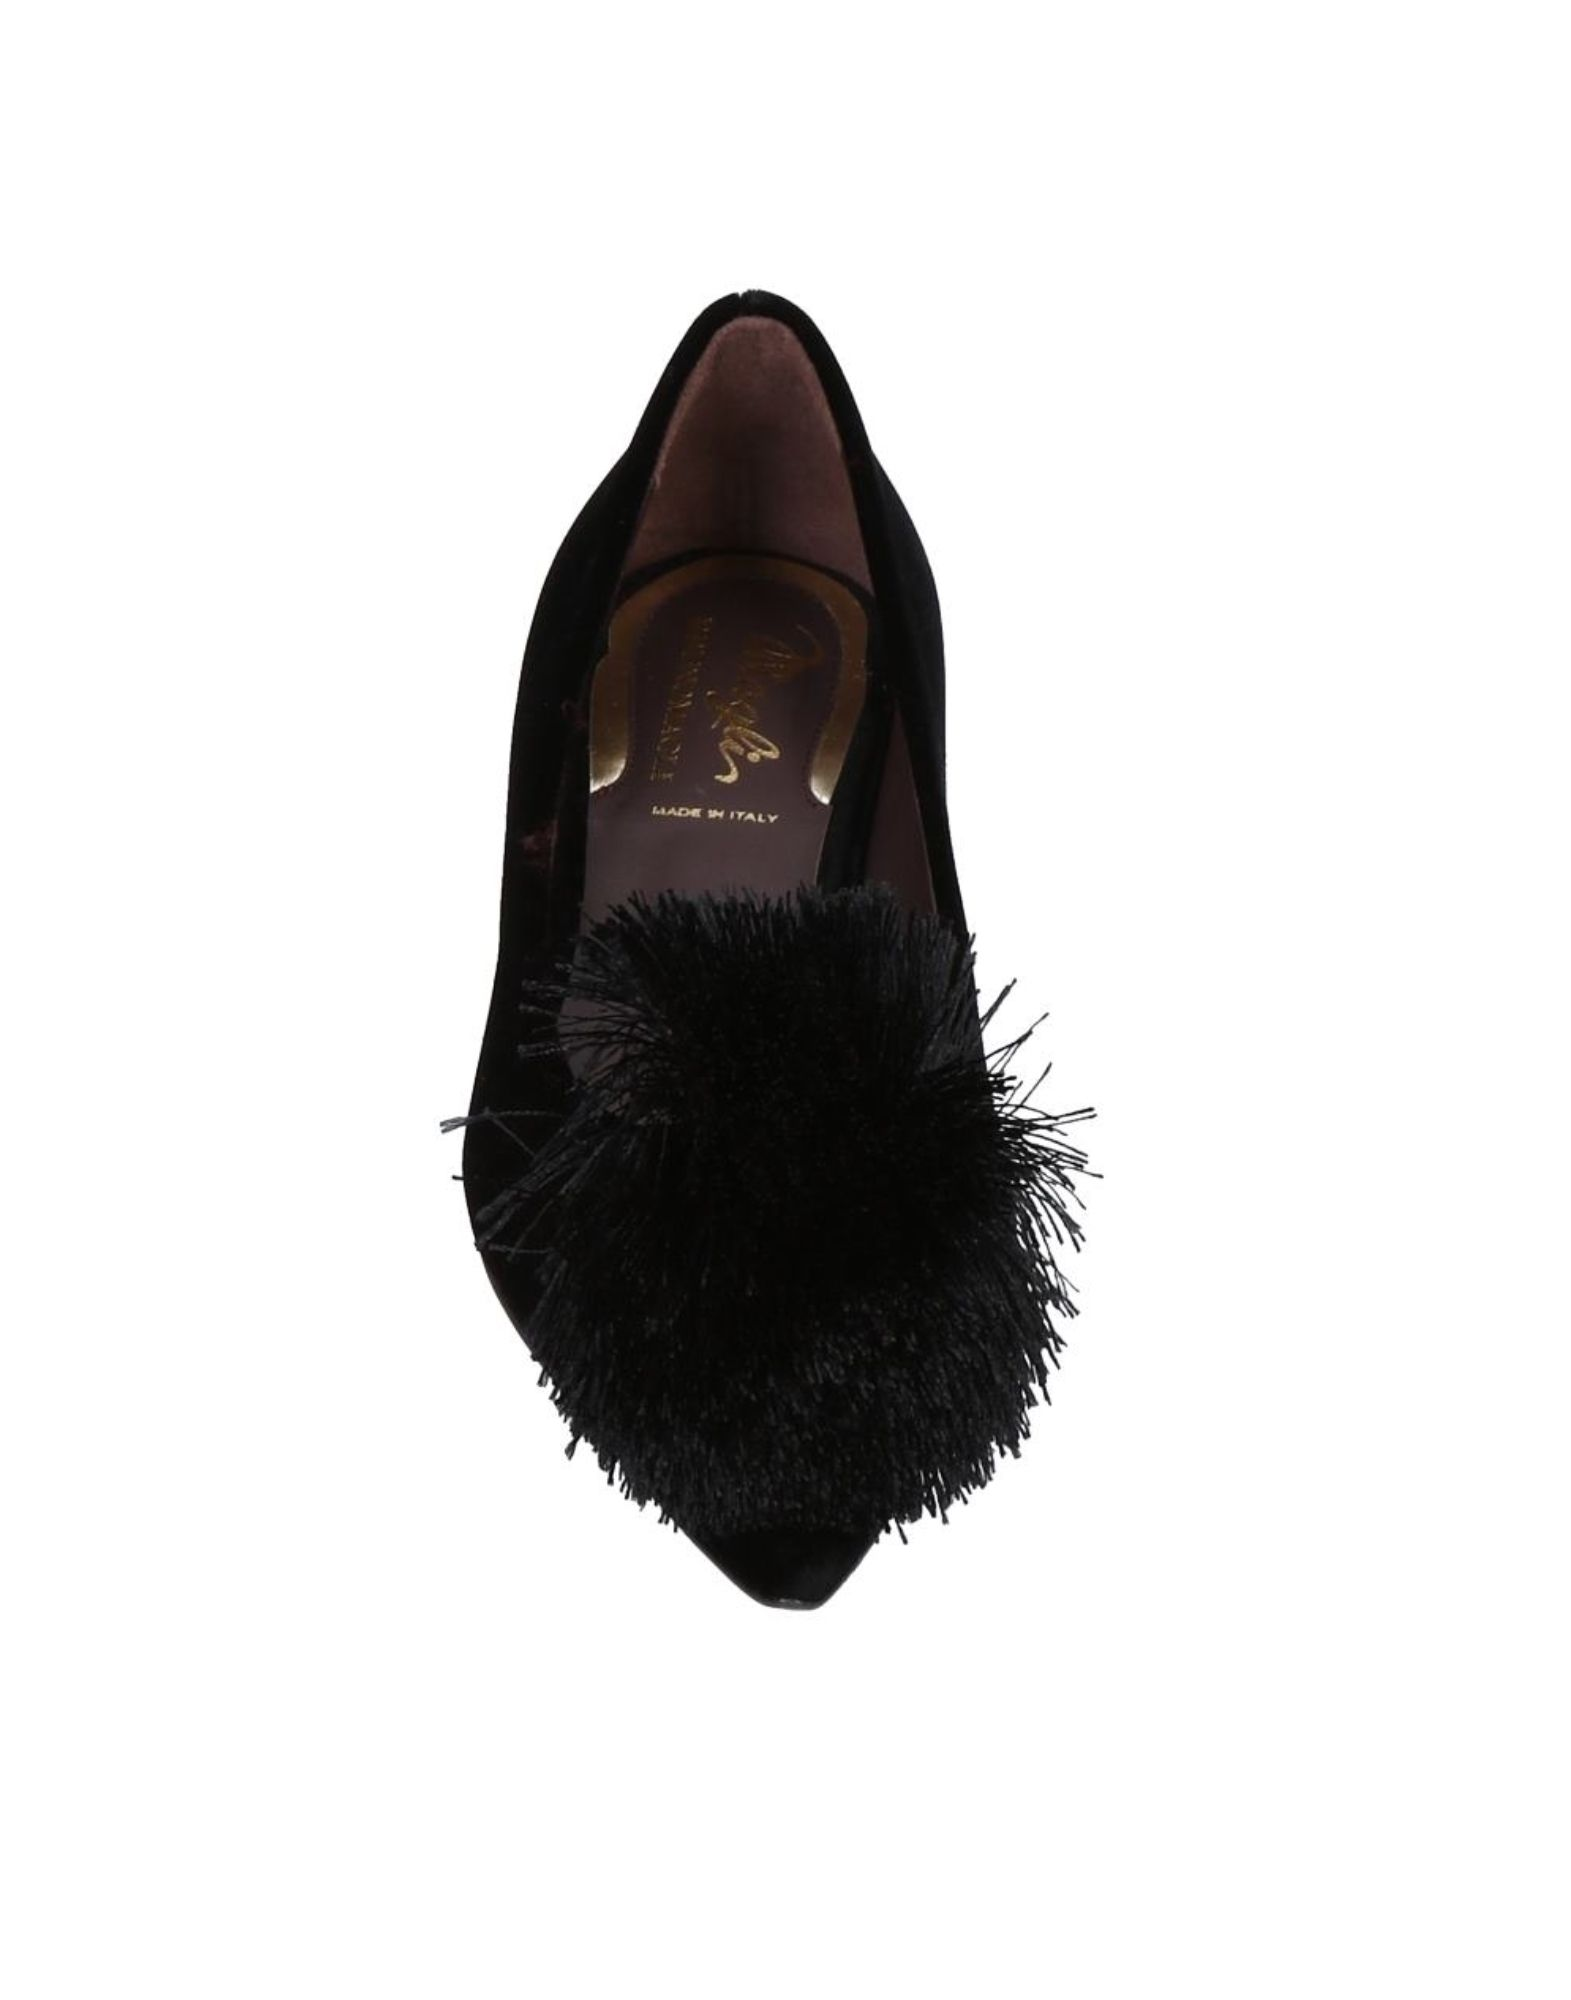 Stilvolle billige Schuhe Damen Magli By Bruno Magli Ballerinas Damen Schuhe  11490556VK 5981fb